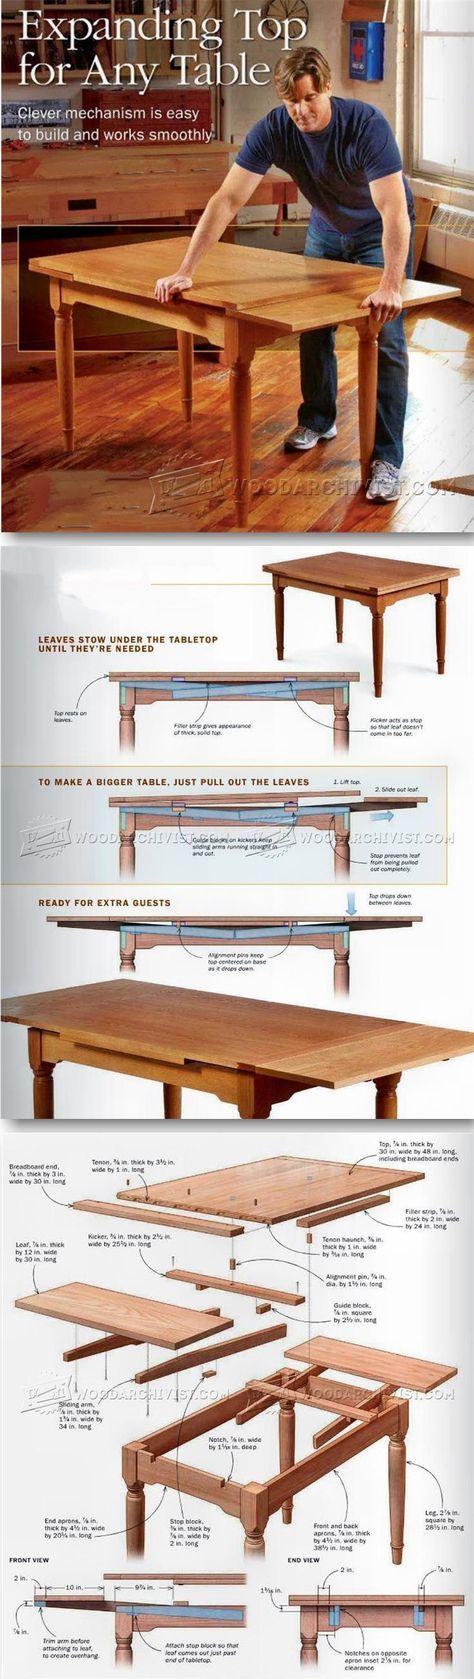 expanding table mechanism expanding table plans furniture and projects woodarchivistcom woodarchivist